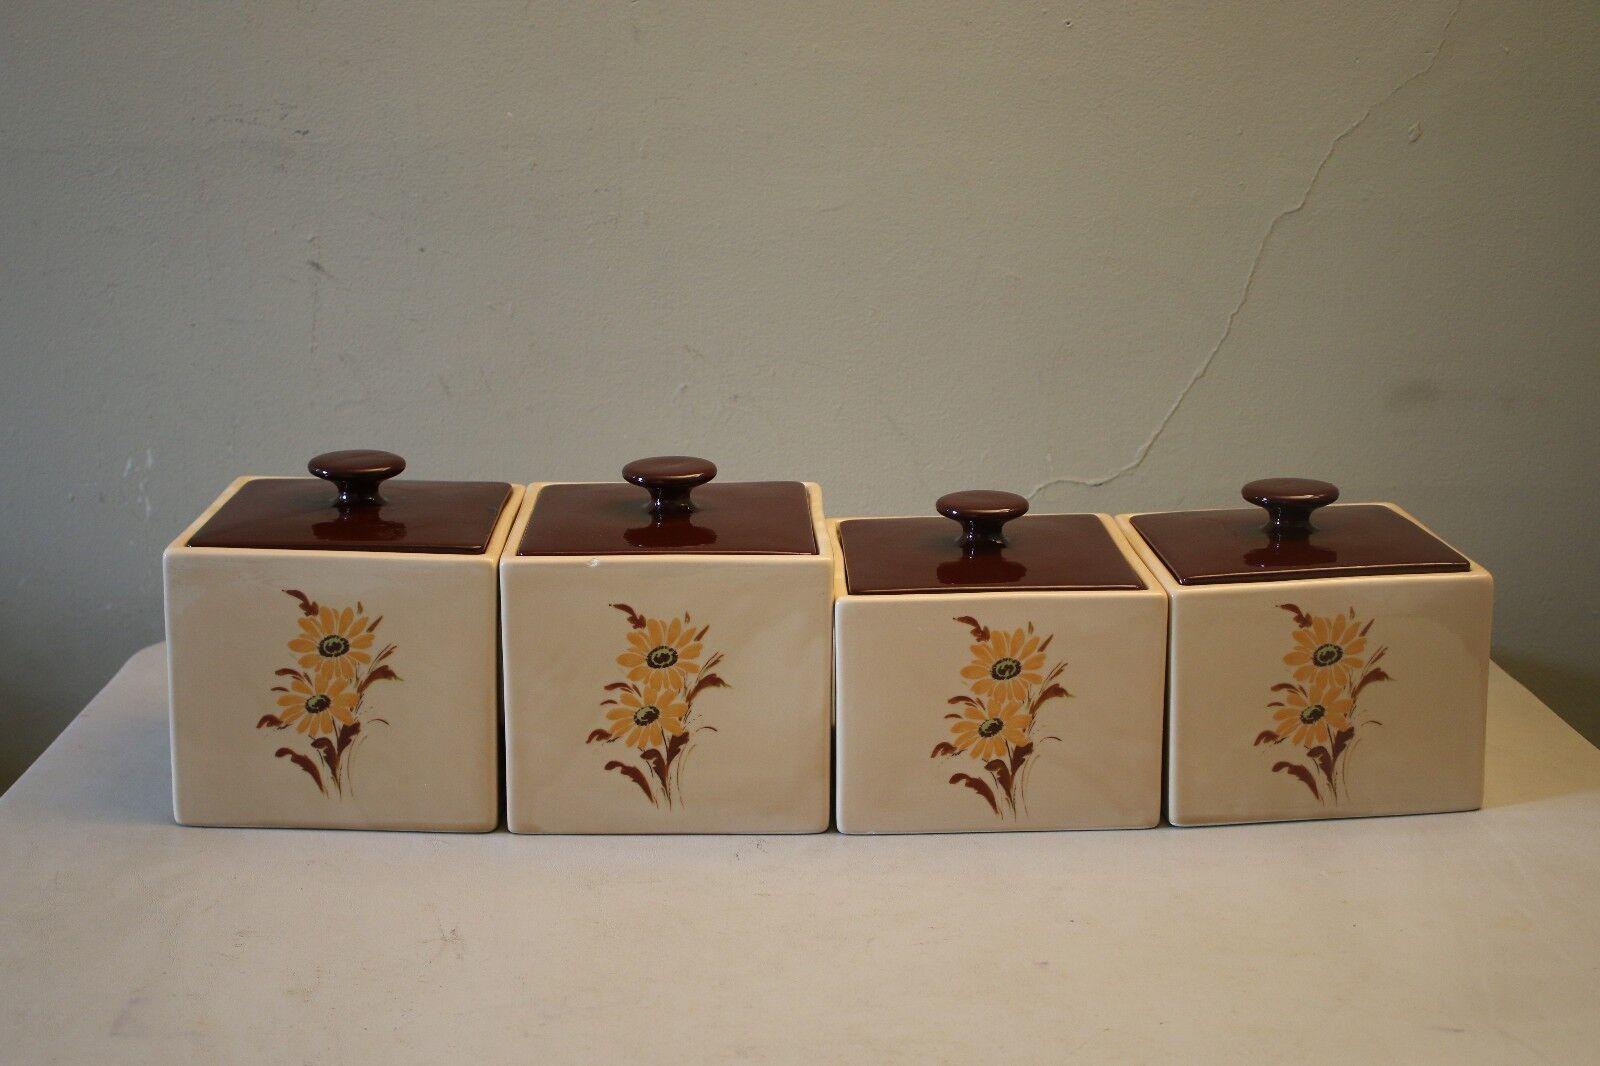 Vintage 4 Piece Ceramic Square Base Tan Canister Set W  Sunflowers